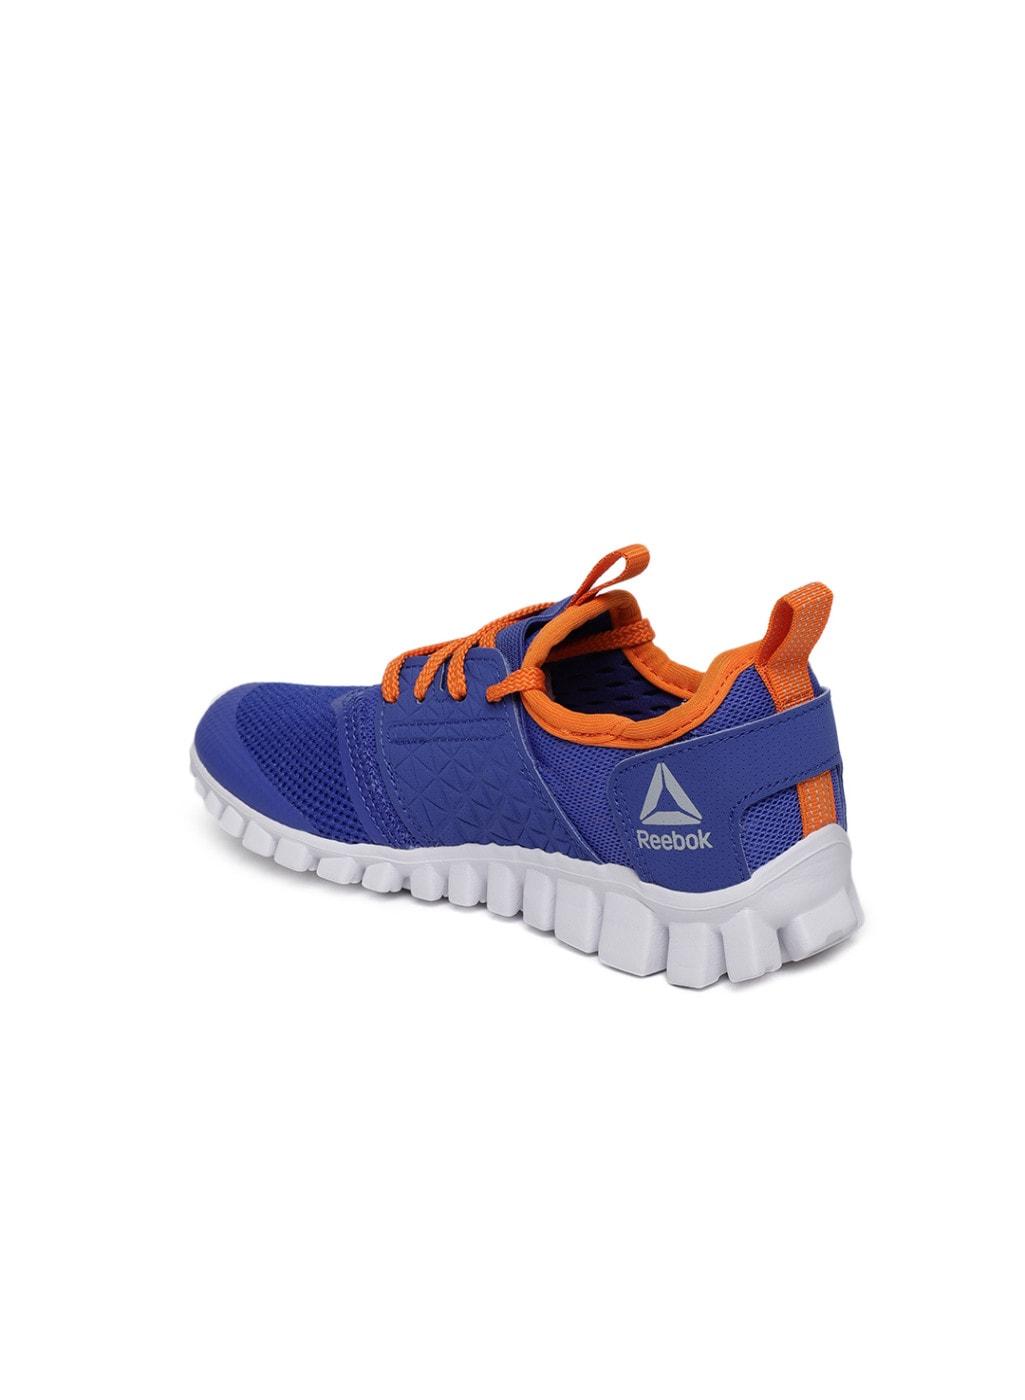 29b3e26d7850 Reebok Identity Flex Jr Navy Blue Running Shoes 300035396 - Buy Reebok  Identity Flex Jr Navy Blue Running Shoes 300035396 online in India - Jabong